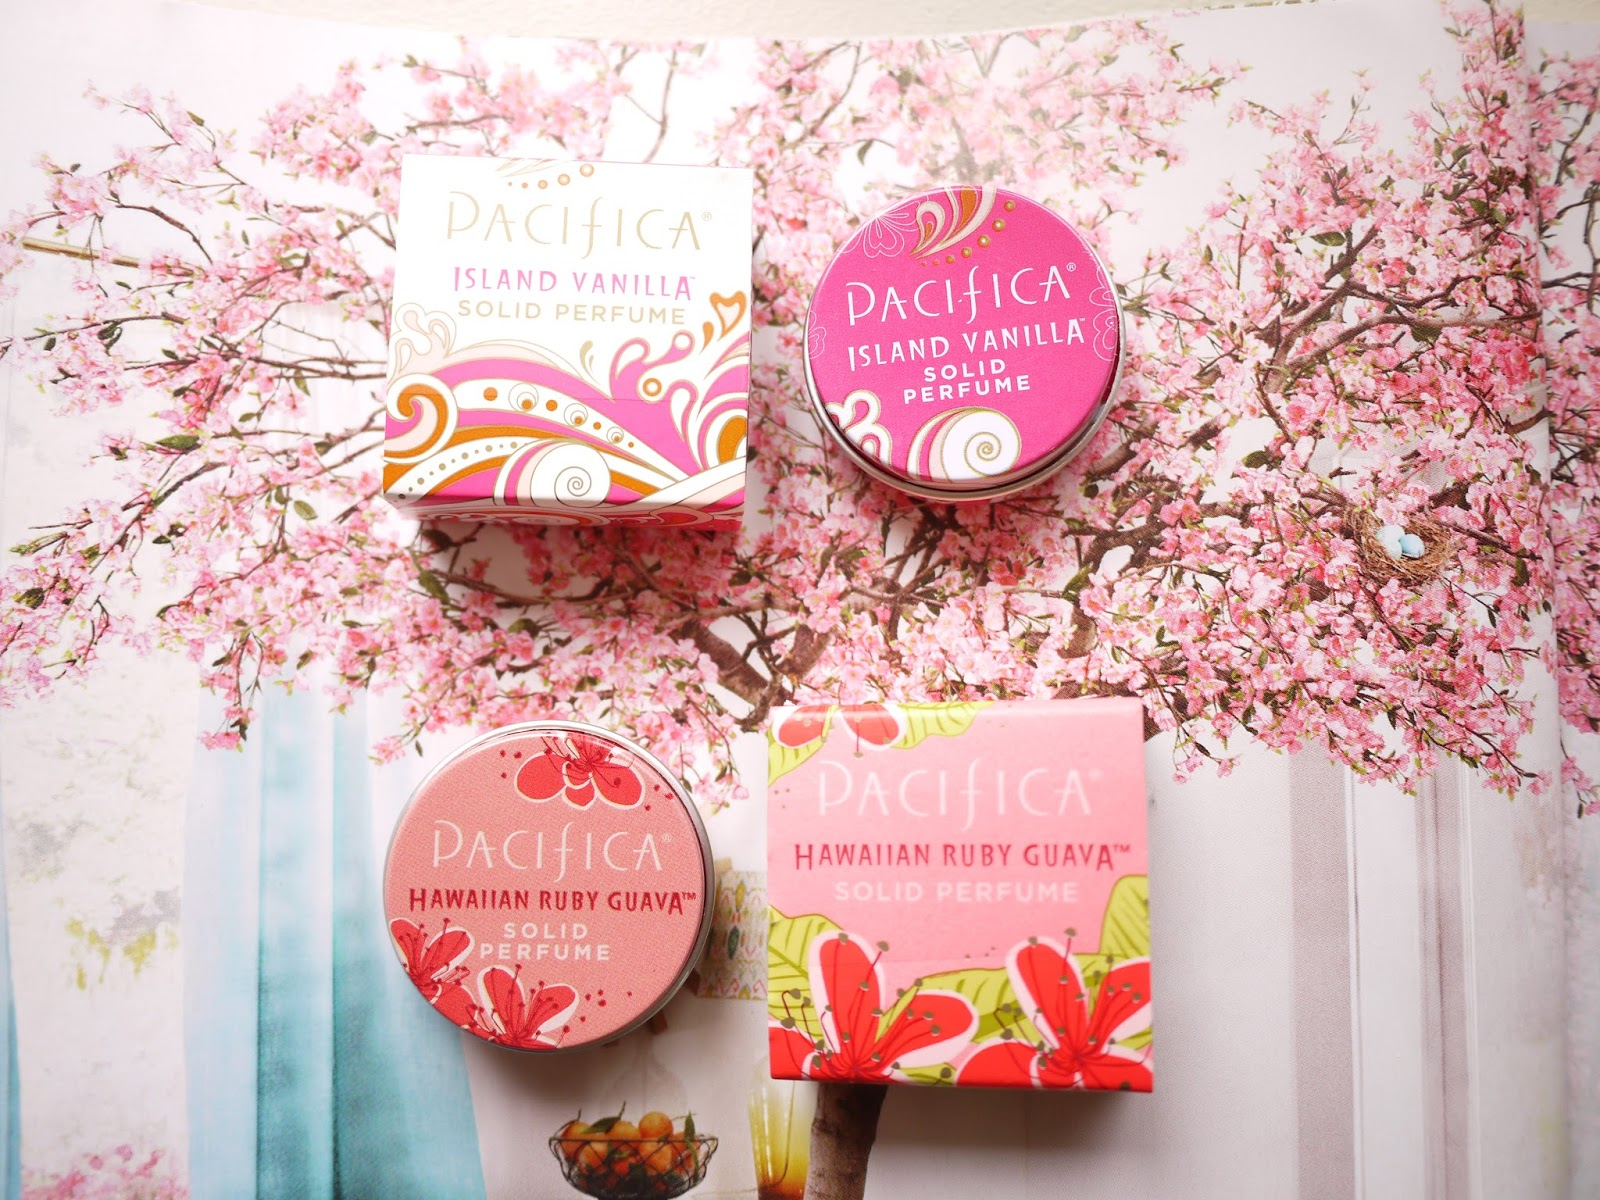 Pacifica Solid Perfumes:Island Vanilla and Hawaiian Ruby Guava